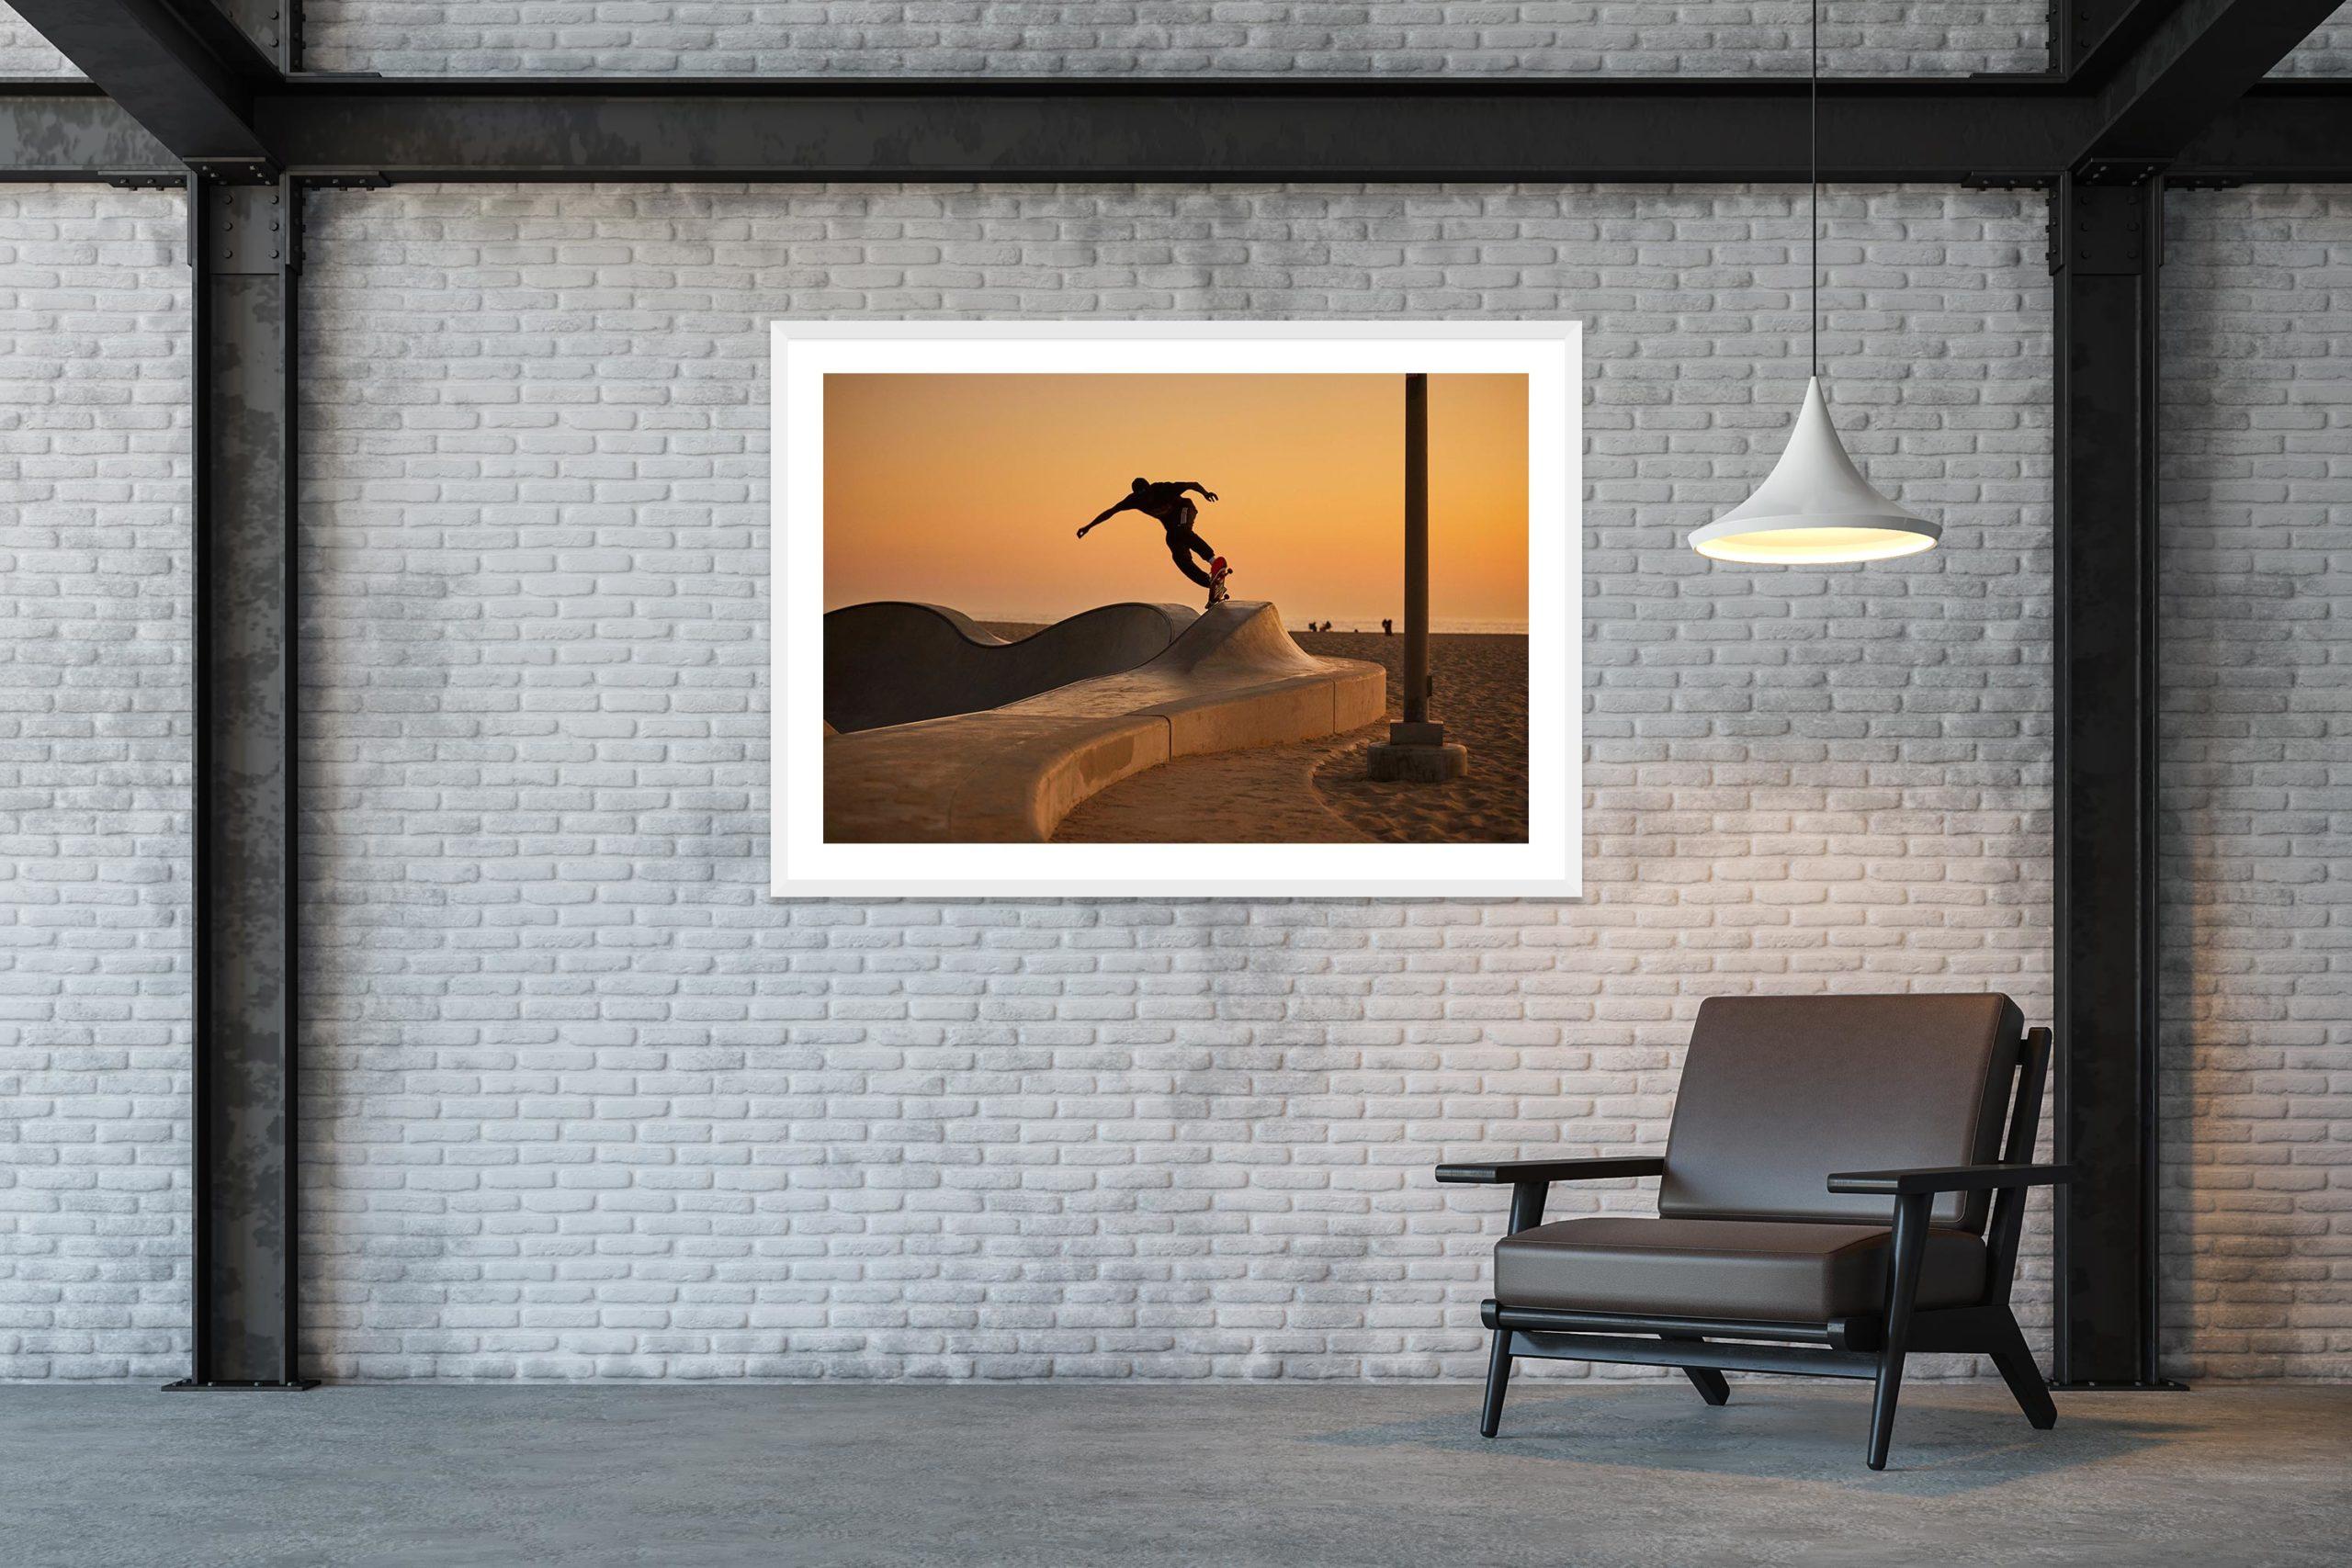 Under Last Light - White Frame - Skate Park, Venice Beach Collection - Fine Art Photography by Toby Dixon